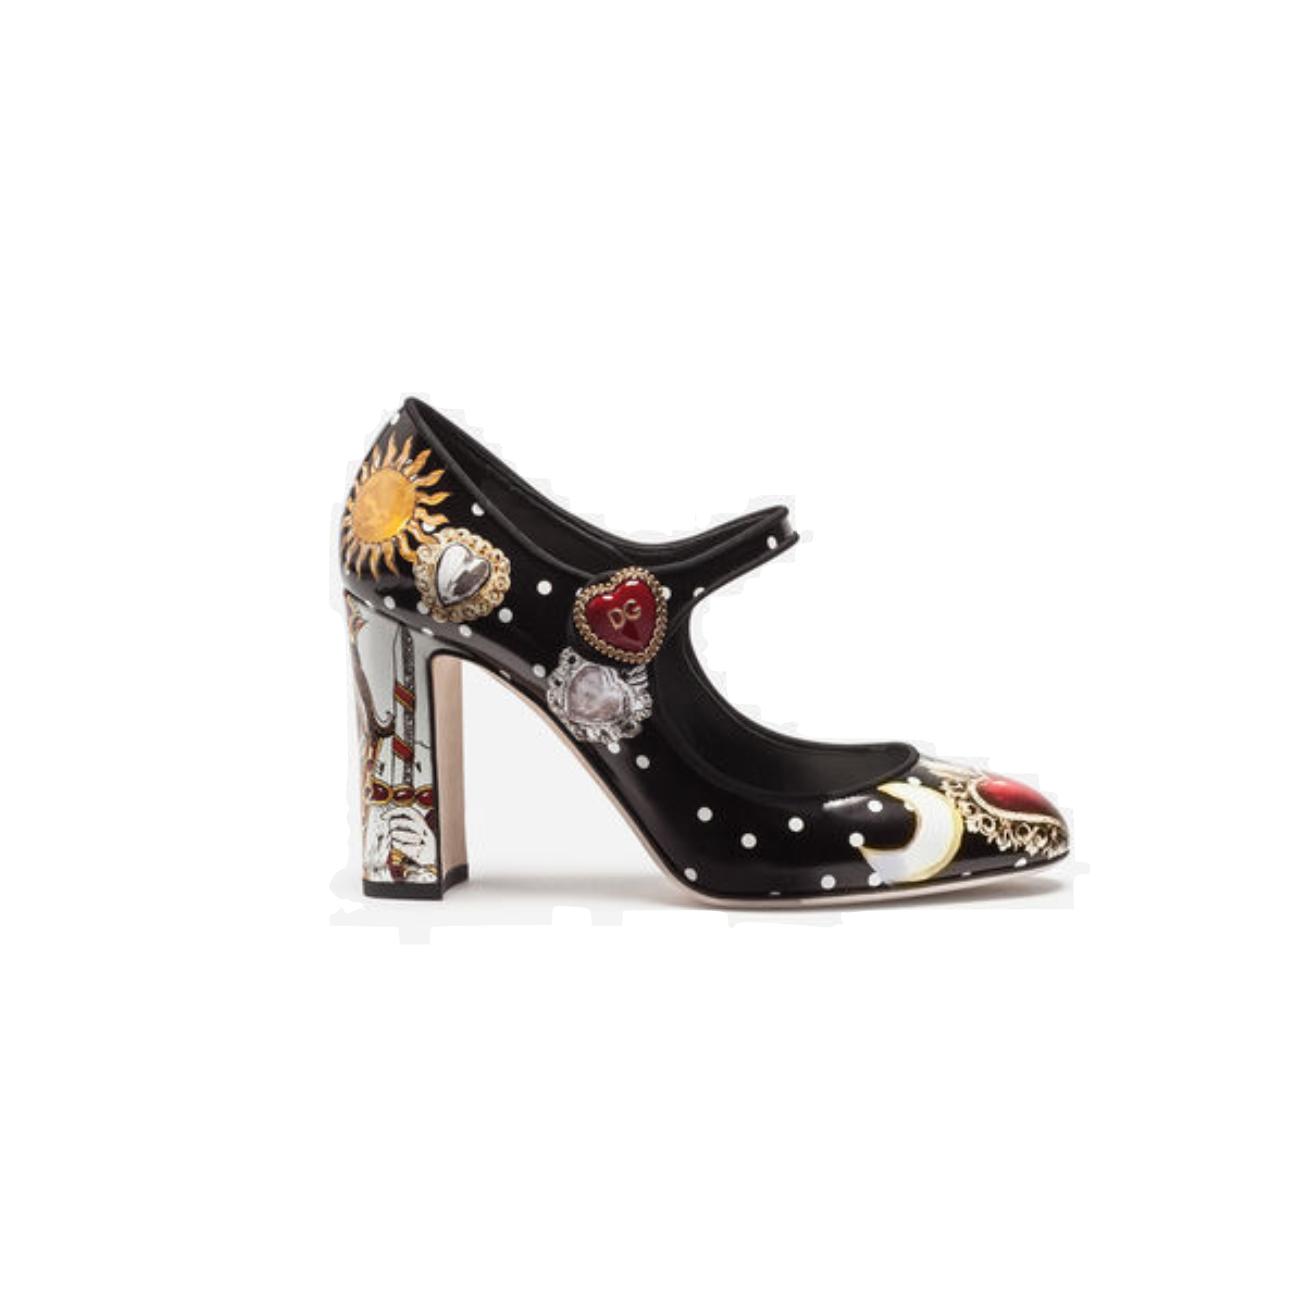 Dolce & Gabbana's Mary Jane shoe